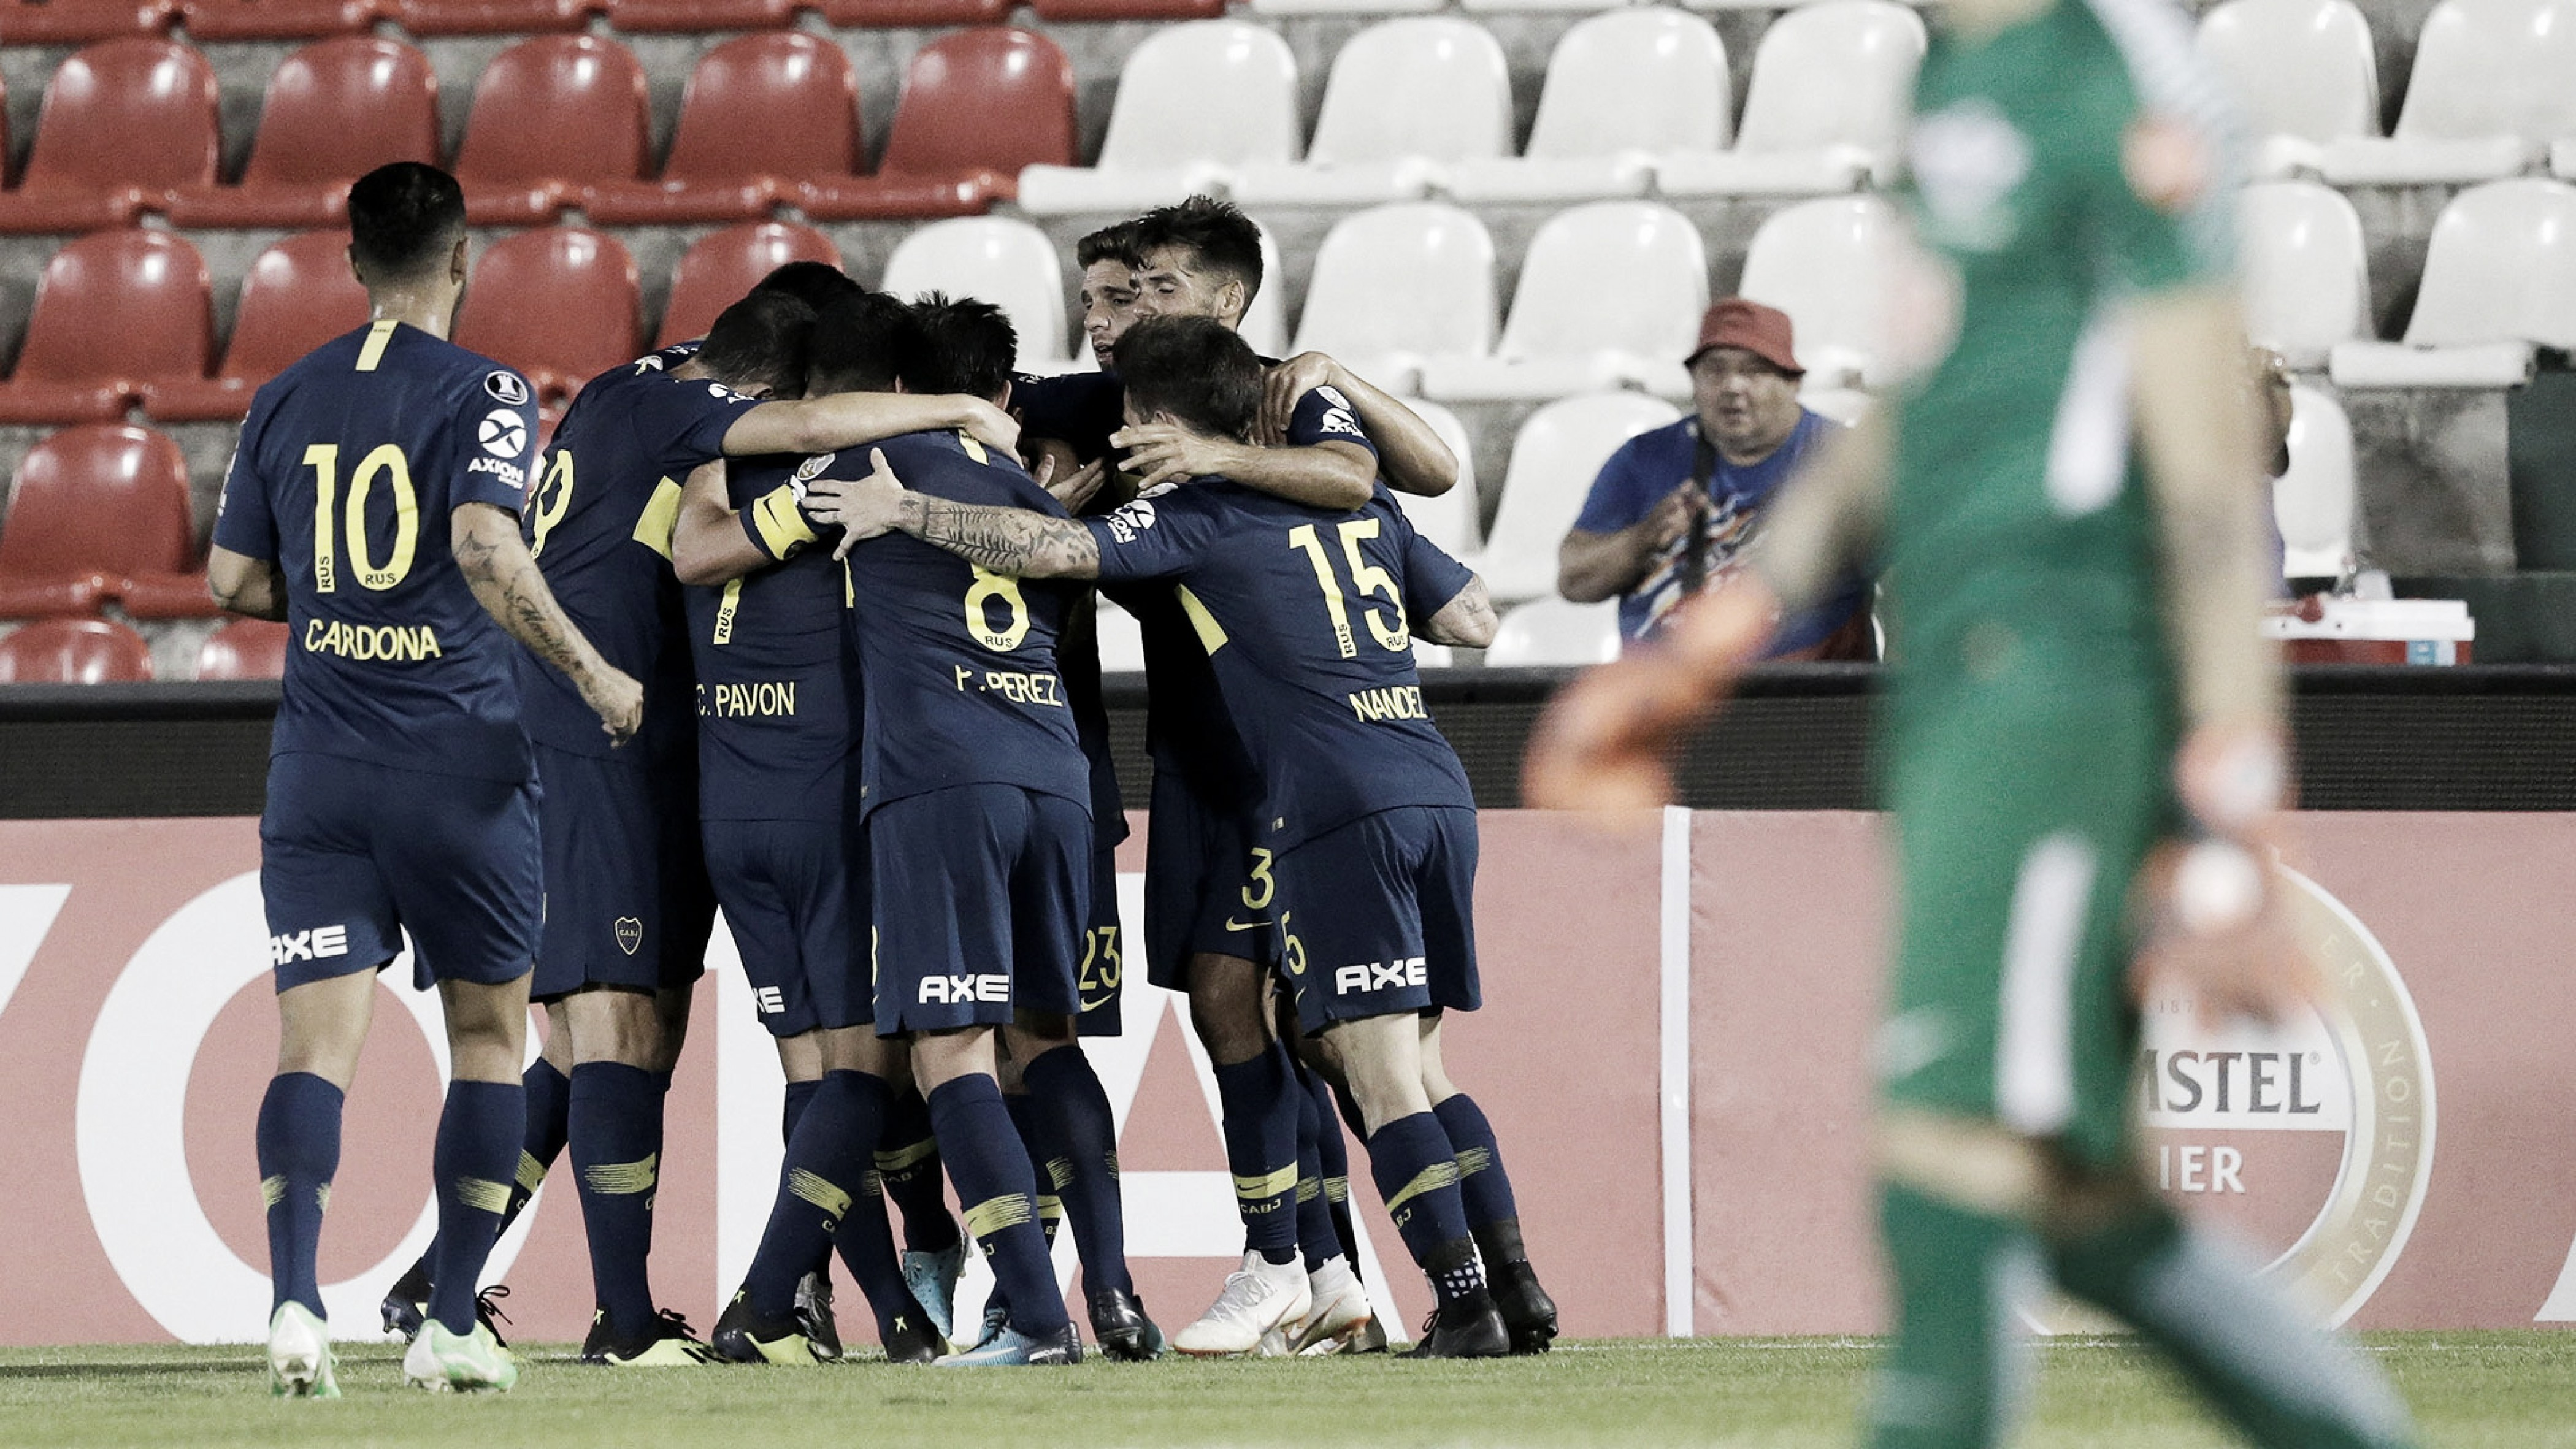 Previa Boca Juniors - Cruzeiro: diez años después...